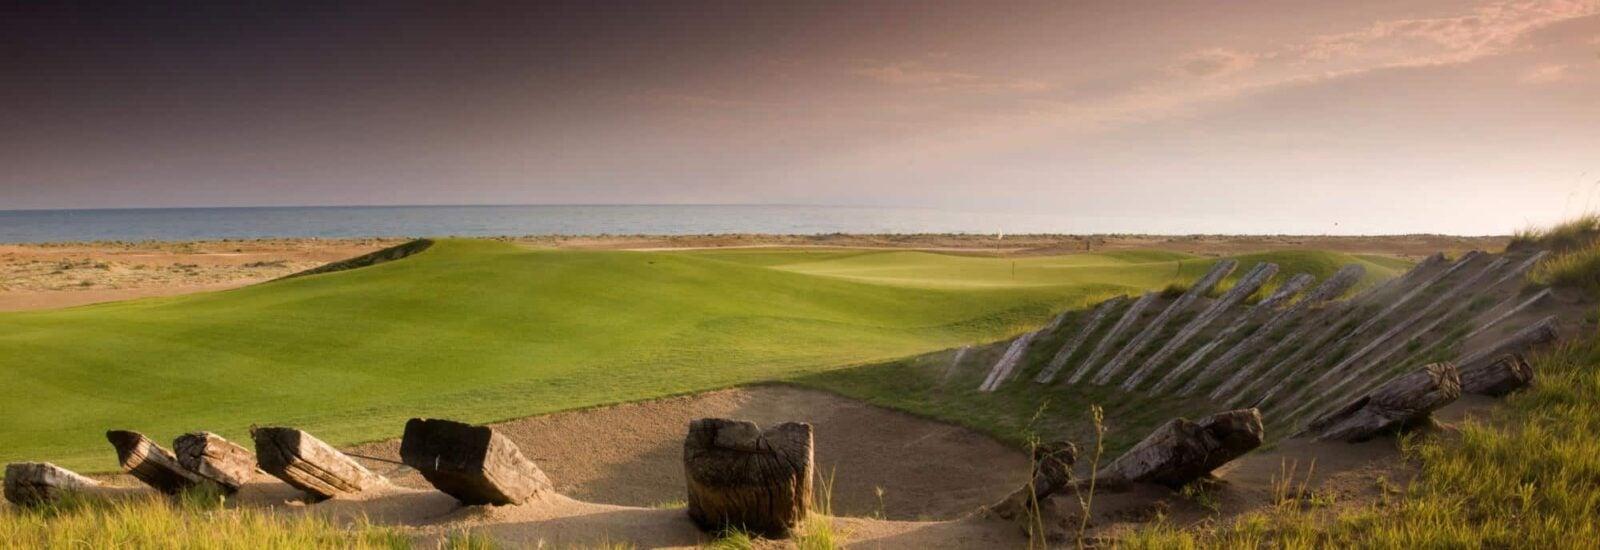 Lykia Links Golfplatz